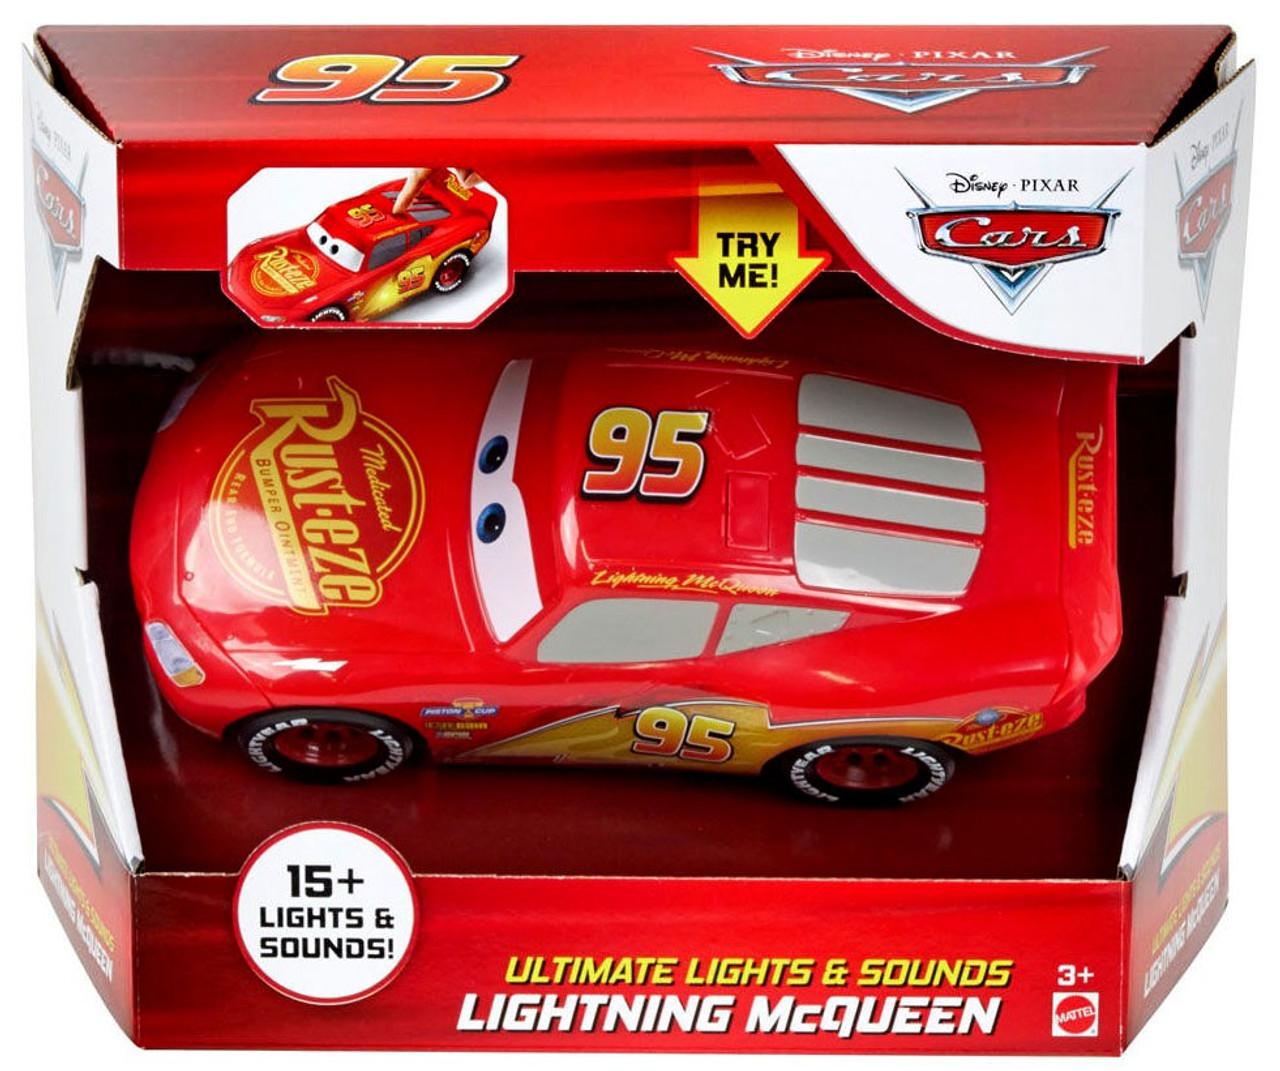 Disney Pixar Cars Cars 3 Ultimate Lights Sounds Lightning Mcqueen Vehicle Mattel Toys Toywiz